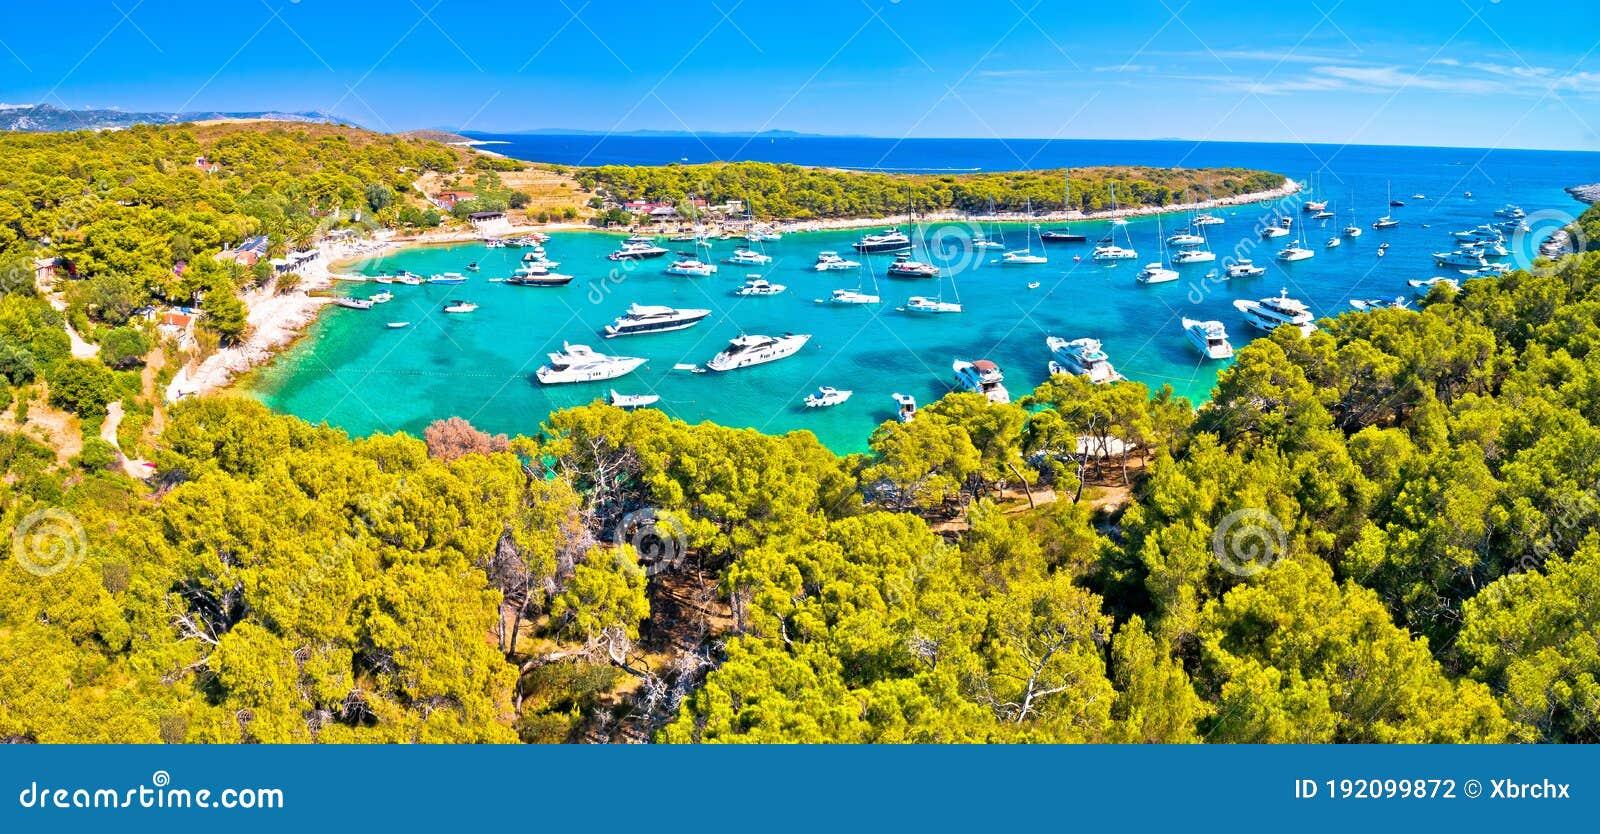 Paklinski Islands. Pakleni. Croatia Stock Photo, Royalty